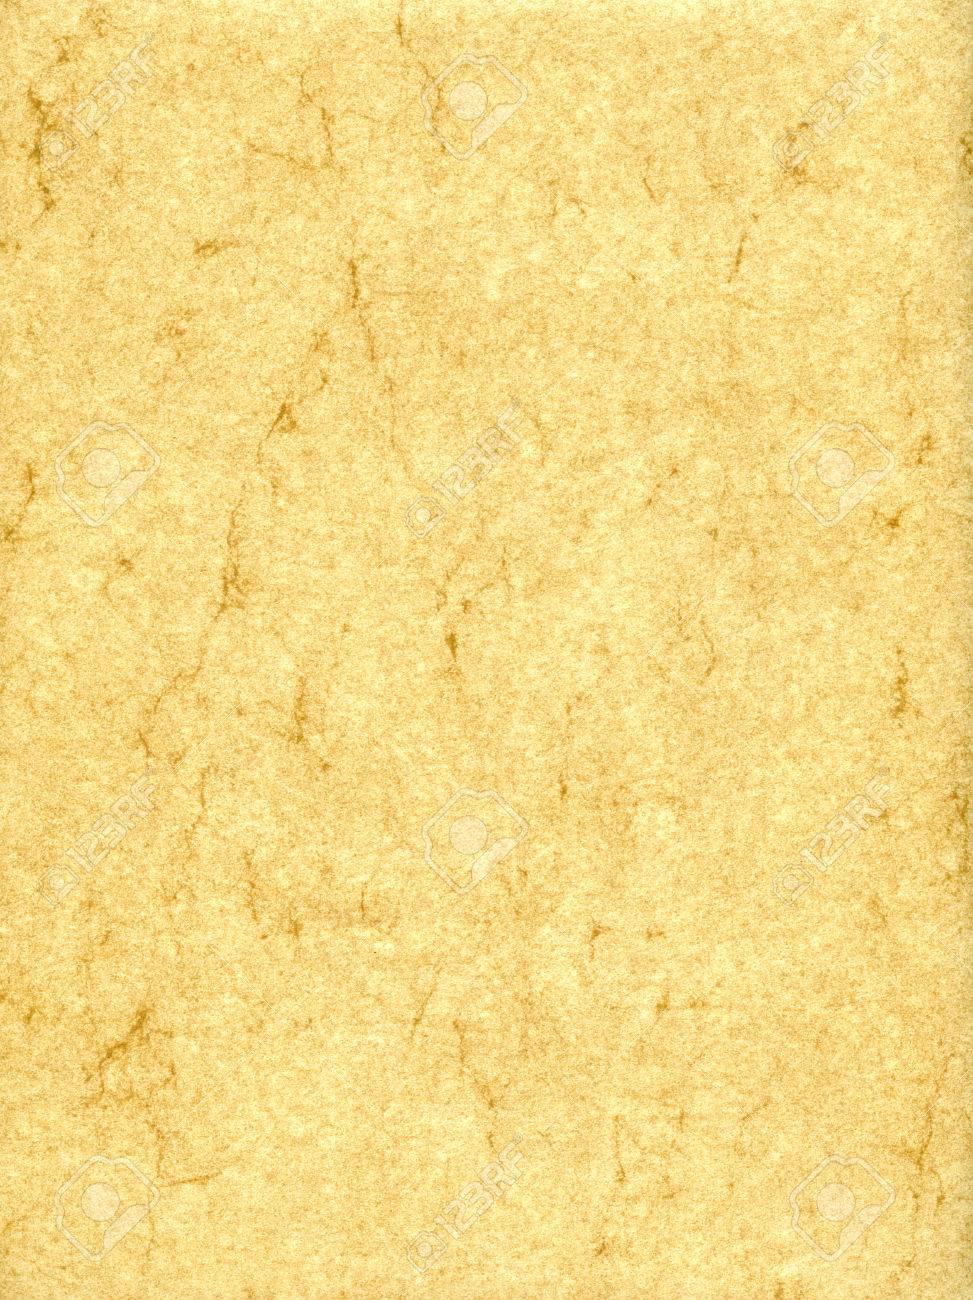 parchment paper texture background surface stock photo picture